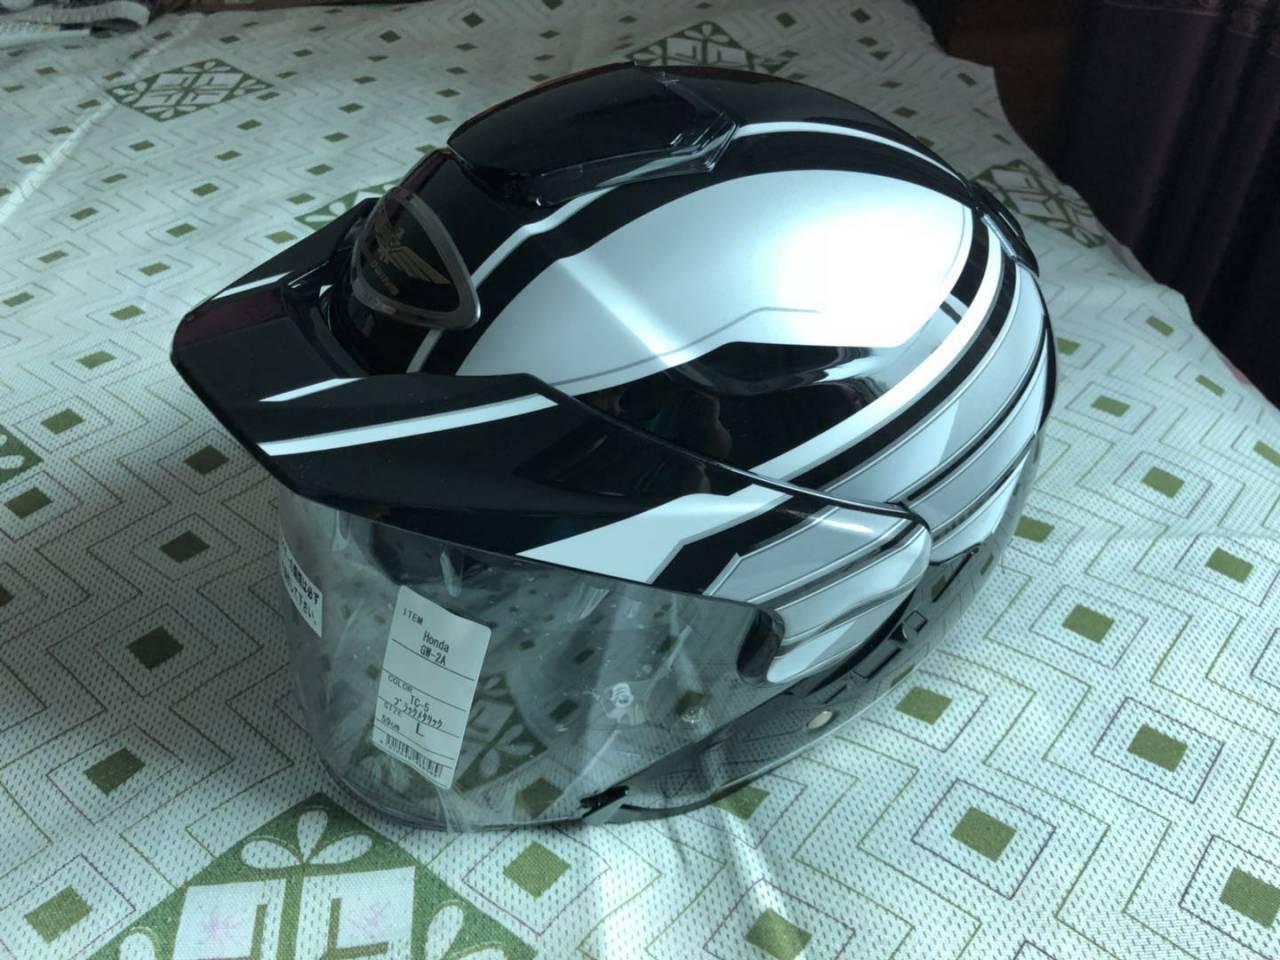 HONDA RIDING GEAR : GW2 Helmet [0SHGS-GW2A-KS]